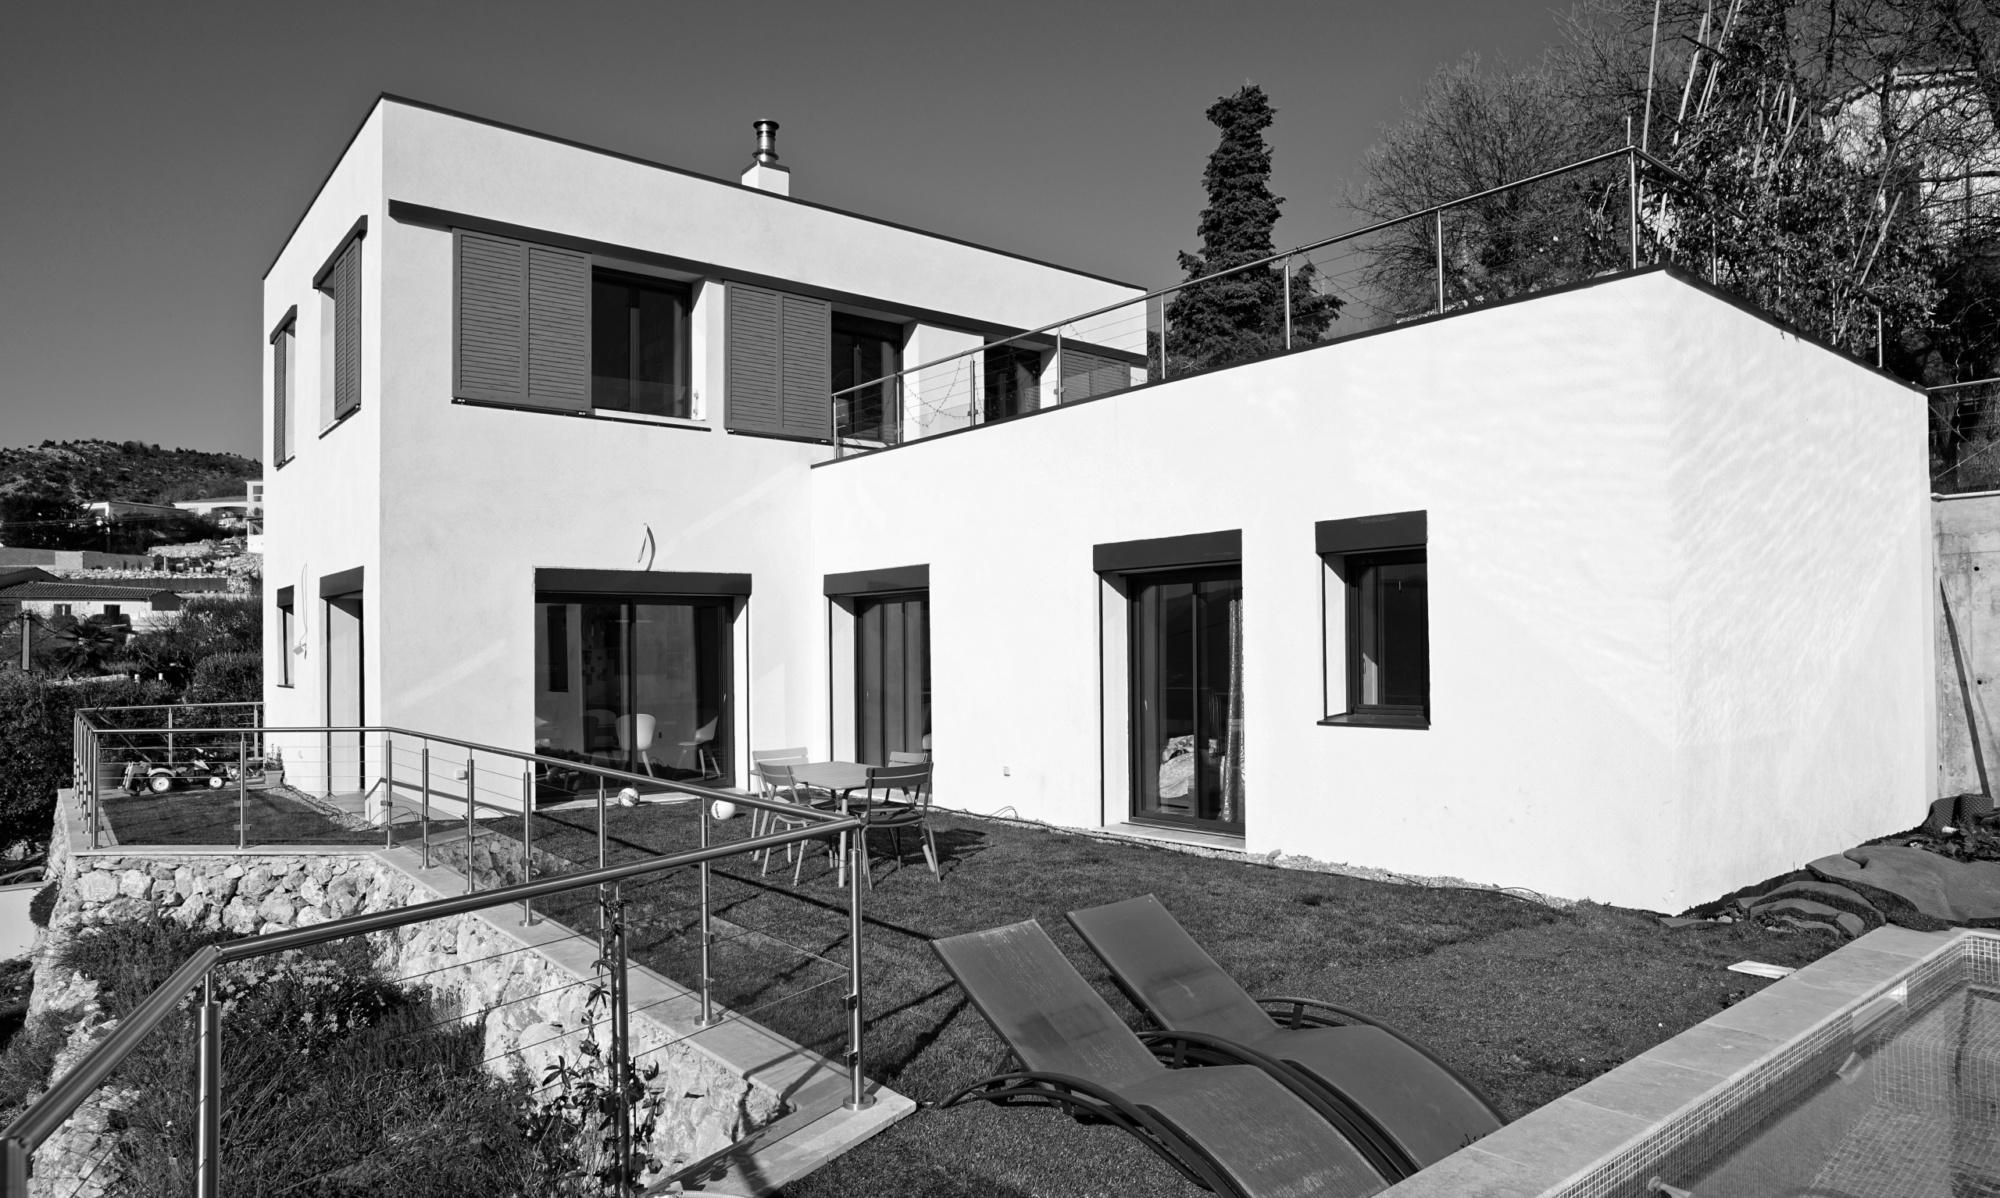 SMARTHOUSE[+] ARCHITECTURE